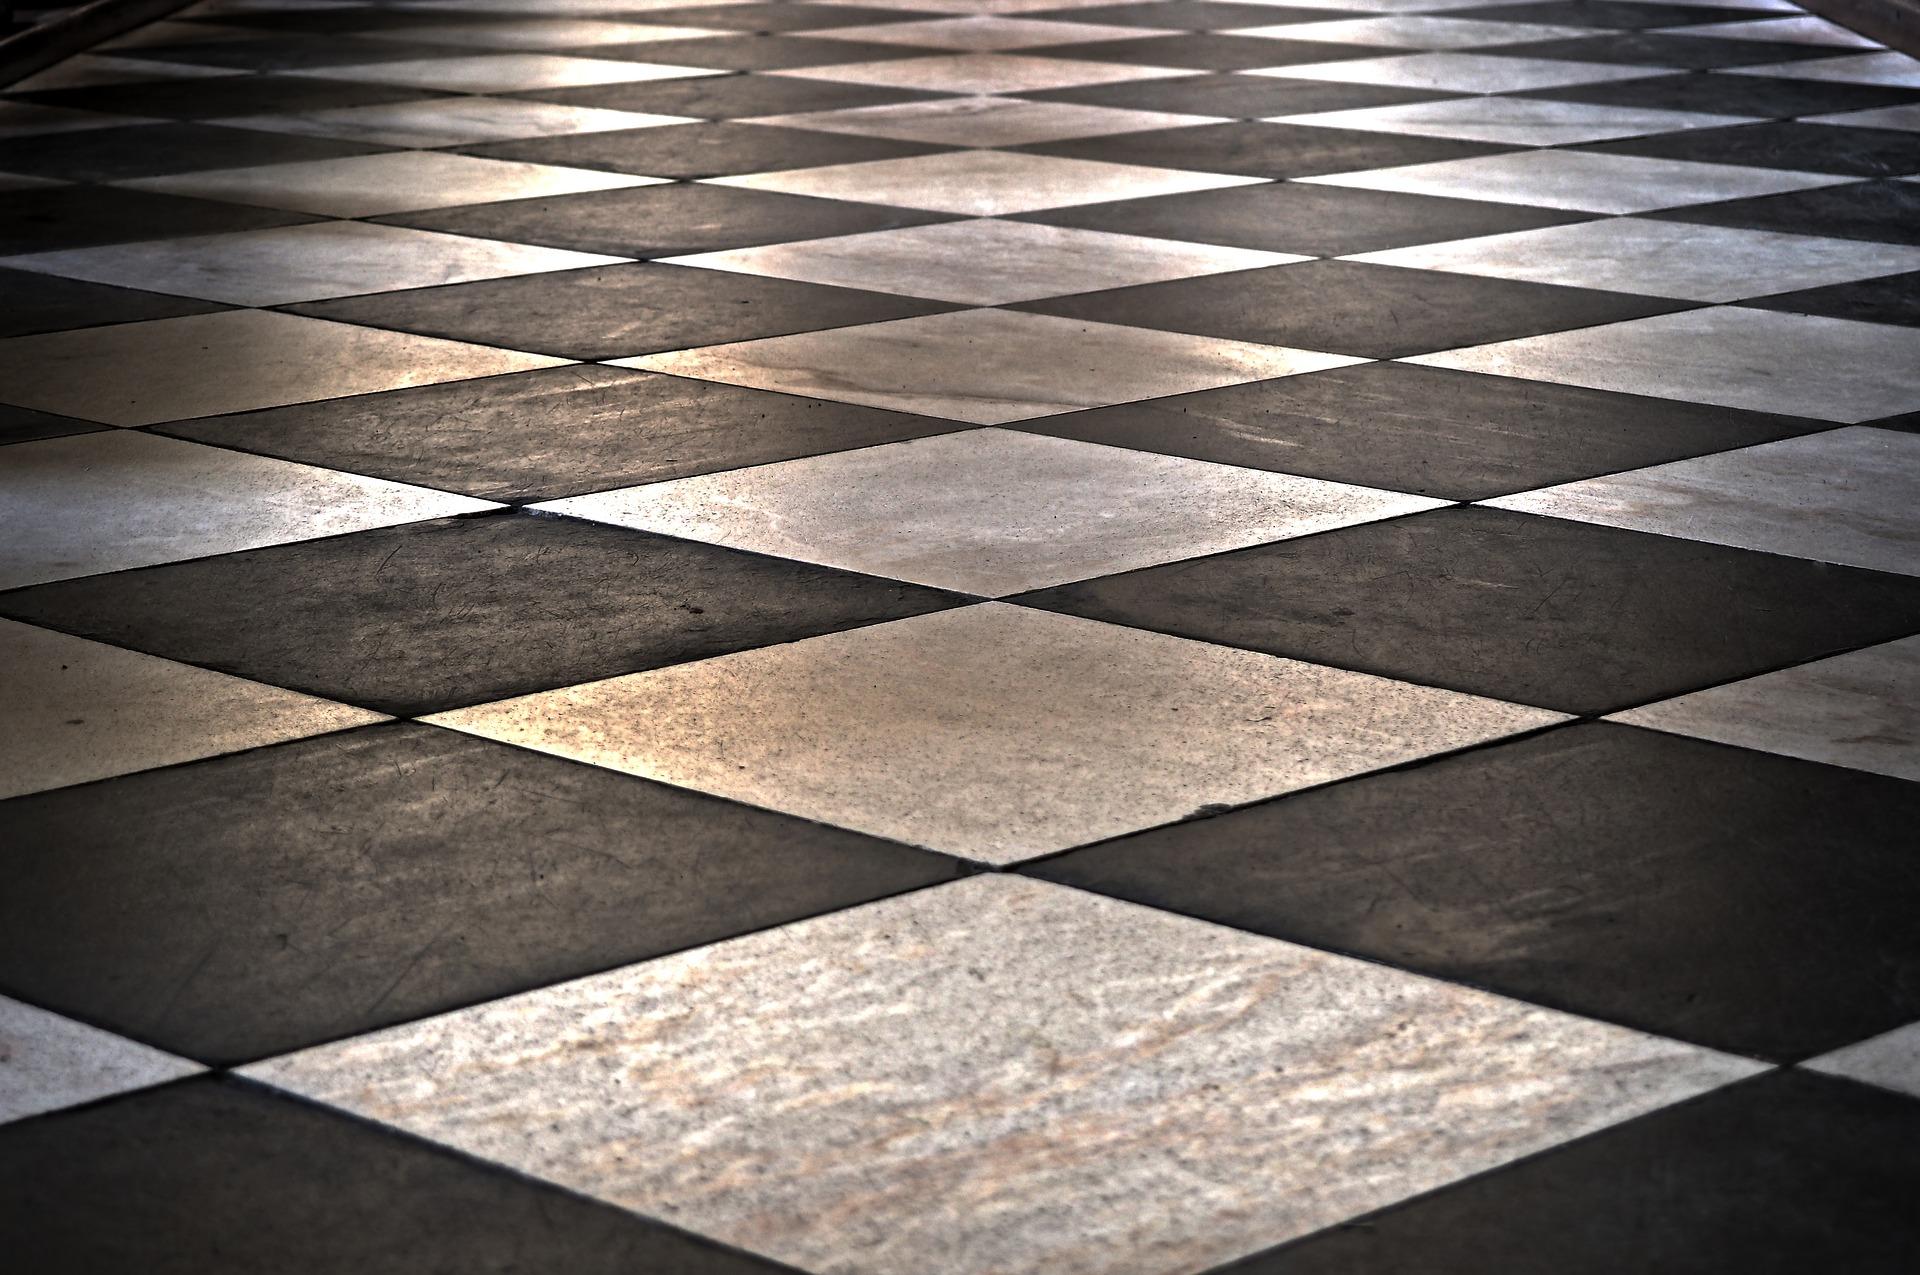 pattern-3180129_1920